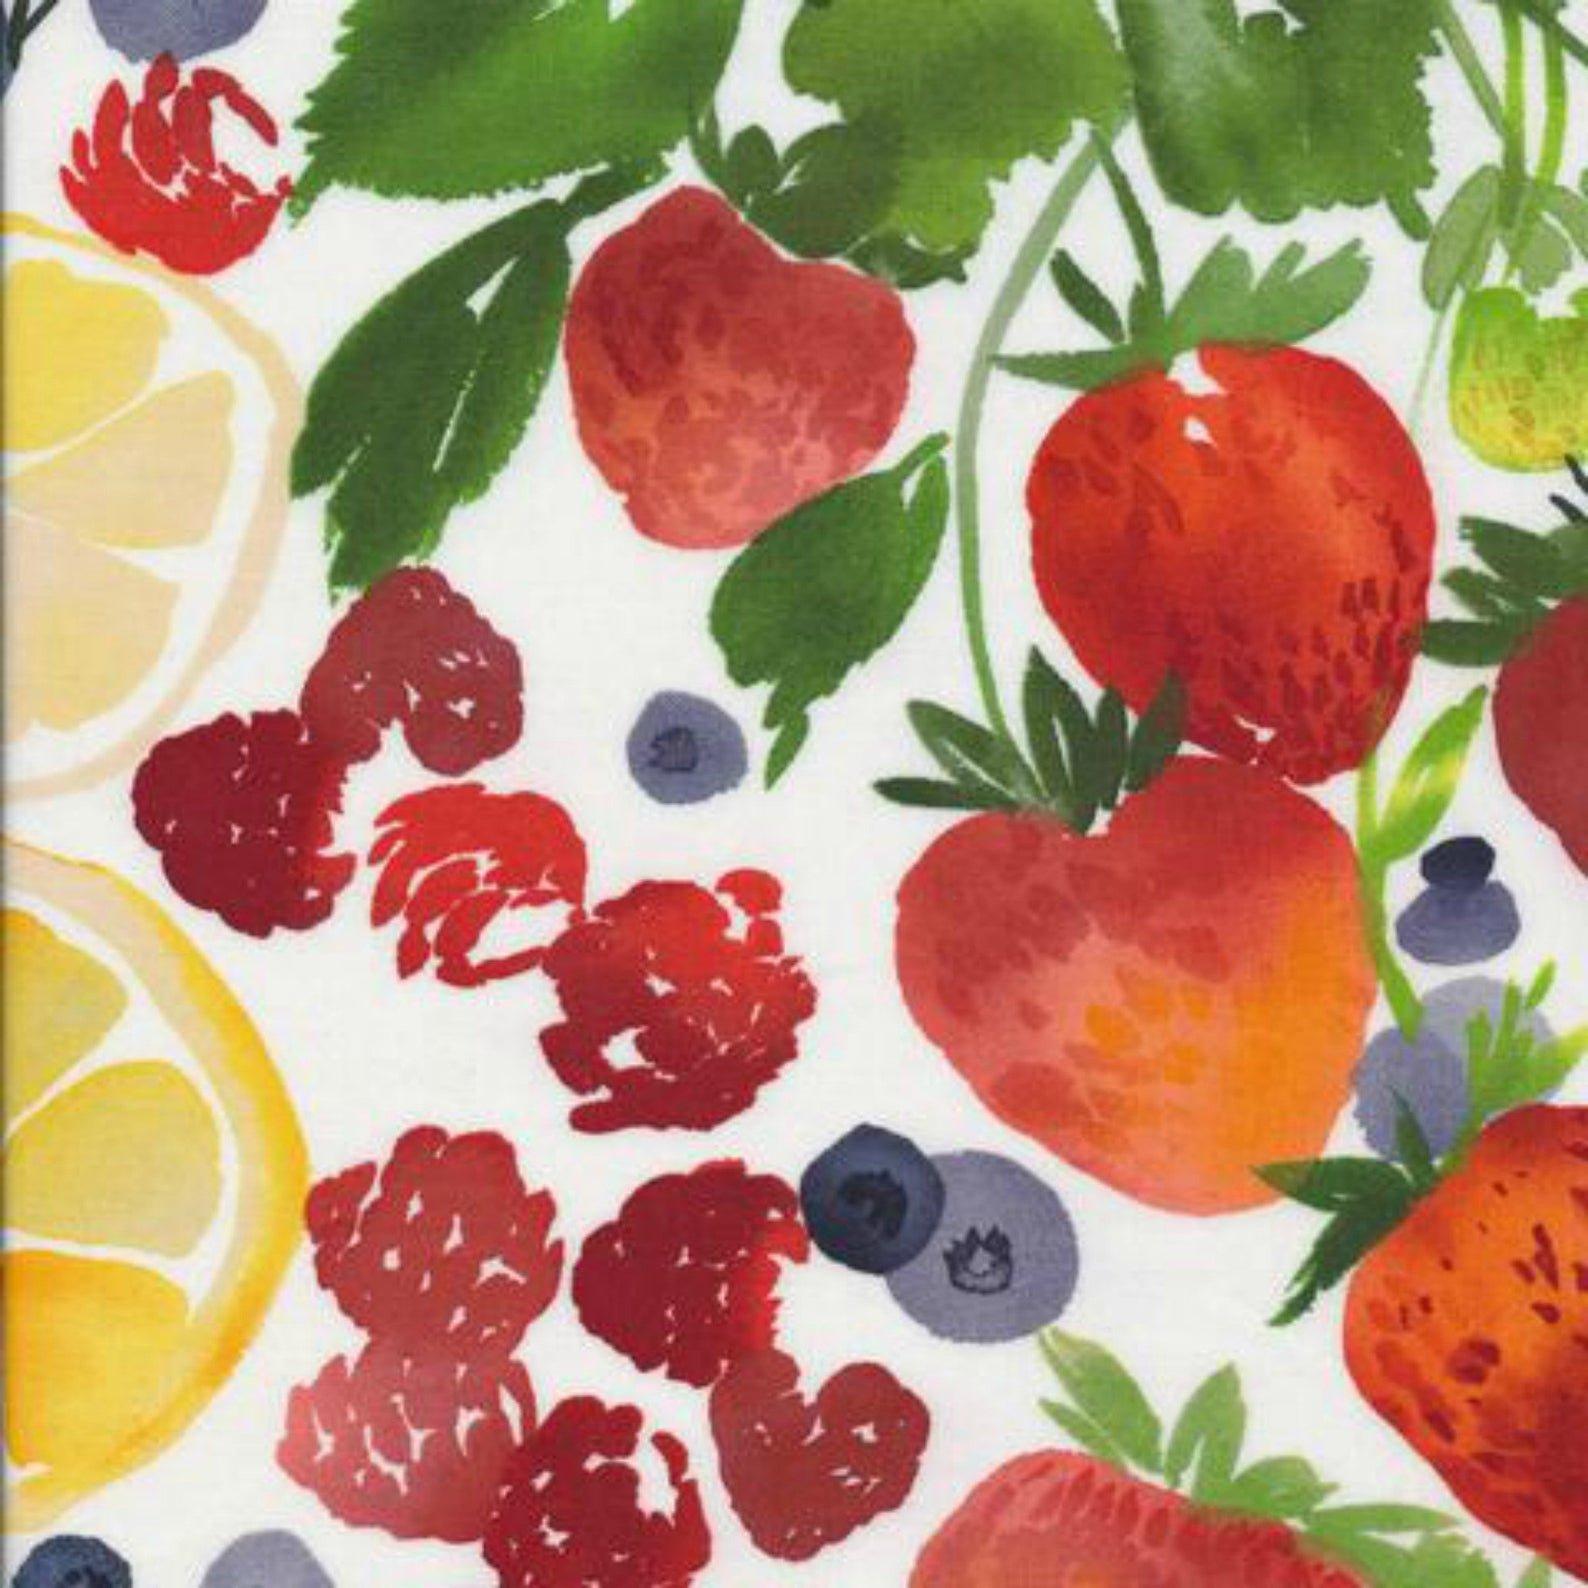 Berry Jam - Matte Laminate - Multi - By Yao Cheng For Cloud9 Fabrics